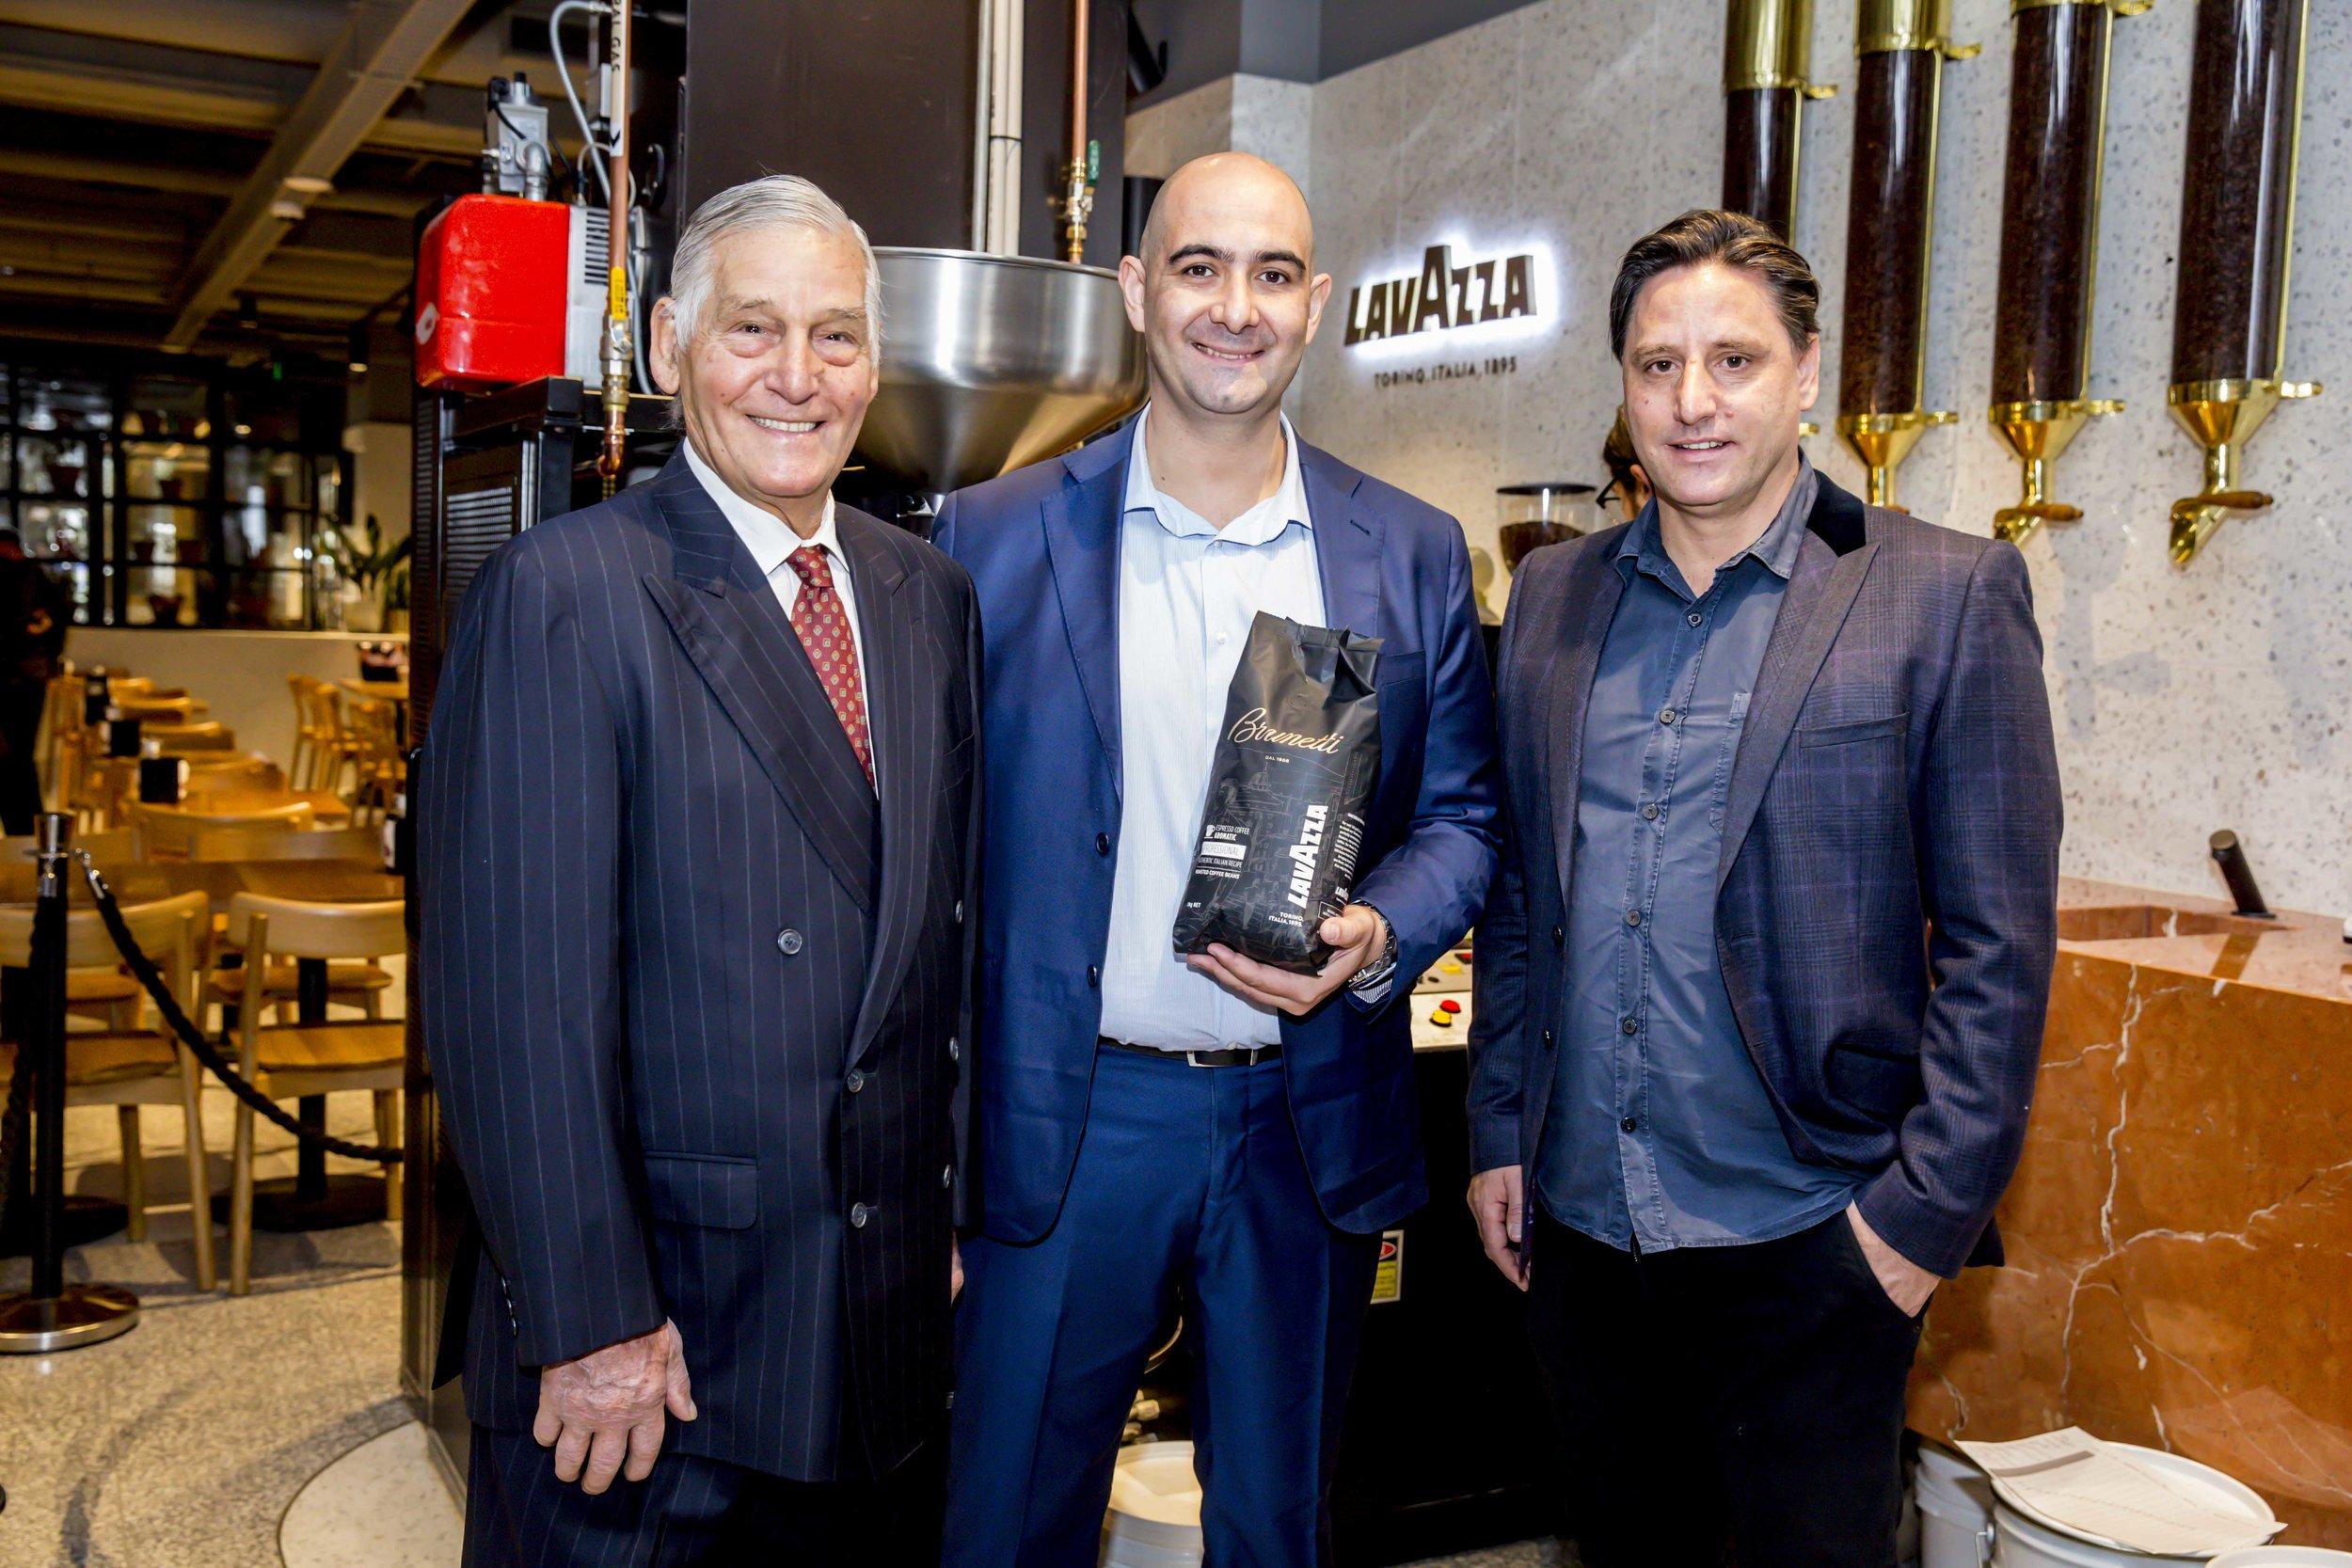 Giorgio Angele_Silvio Zaccareo_Yuri Angele at Brunetti X Lavazza International Coffee Day 1.jpg